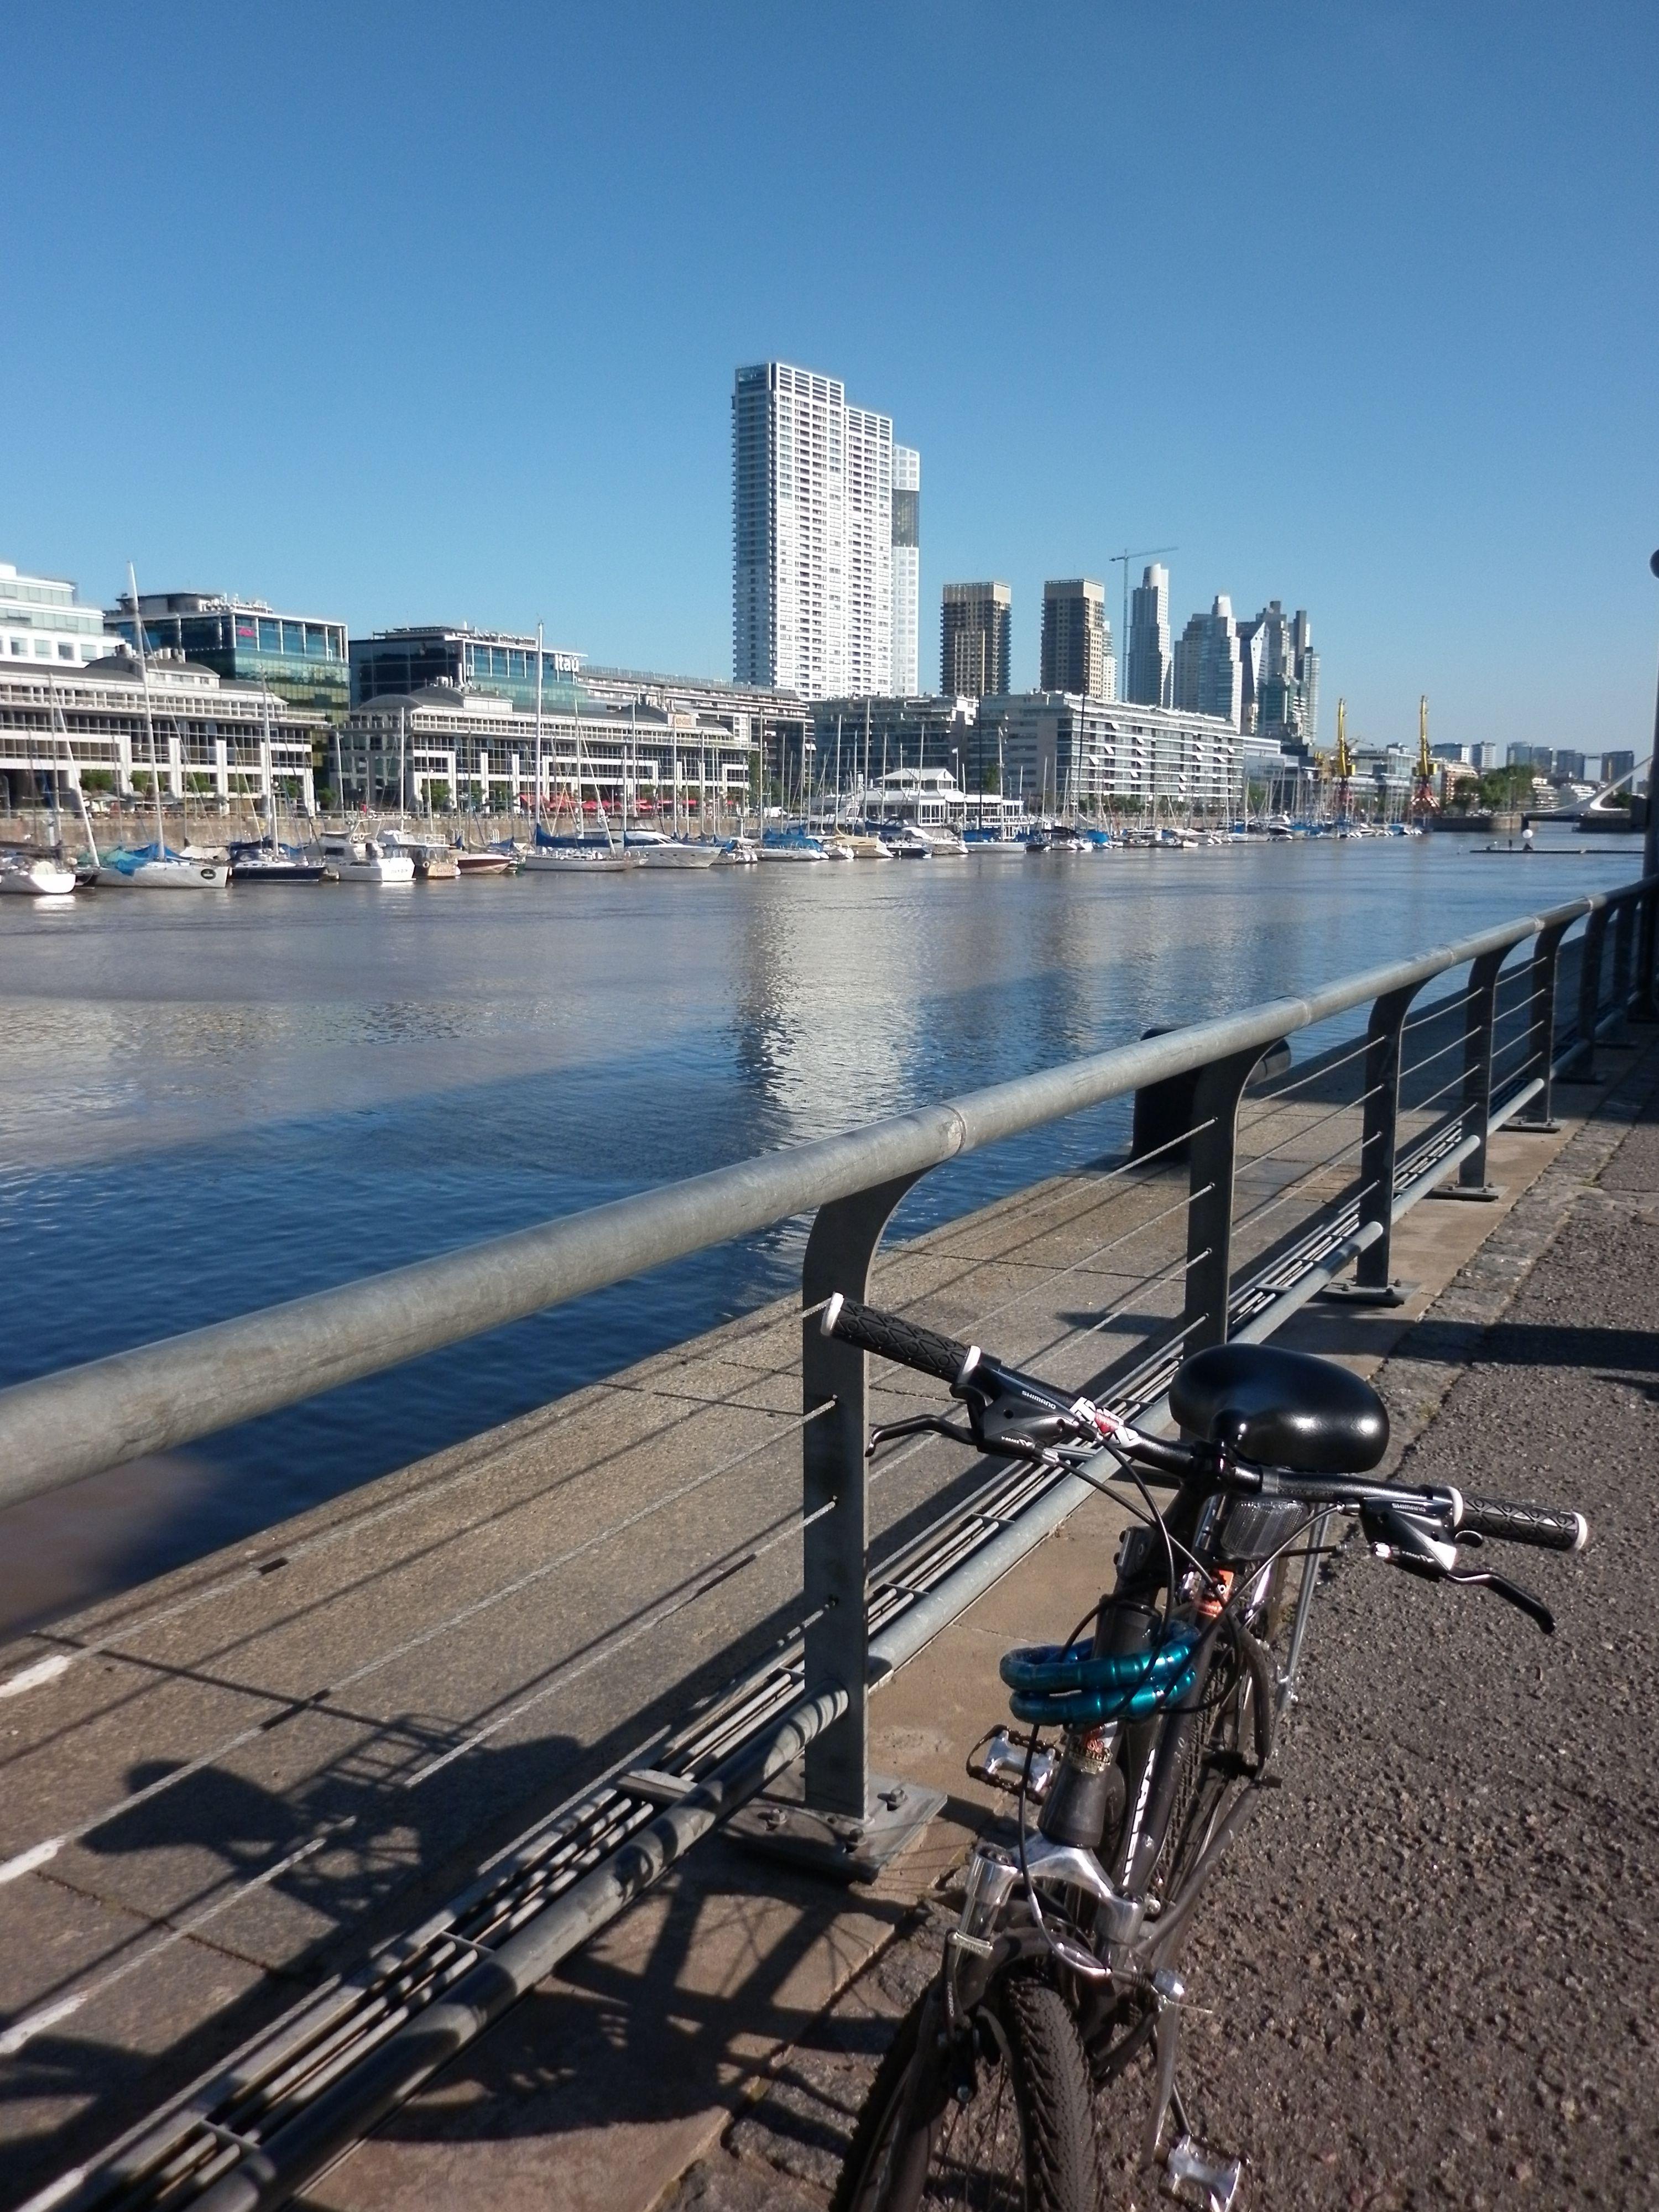 biking on the port